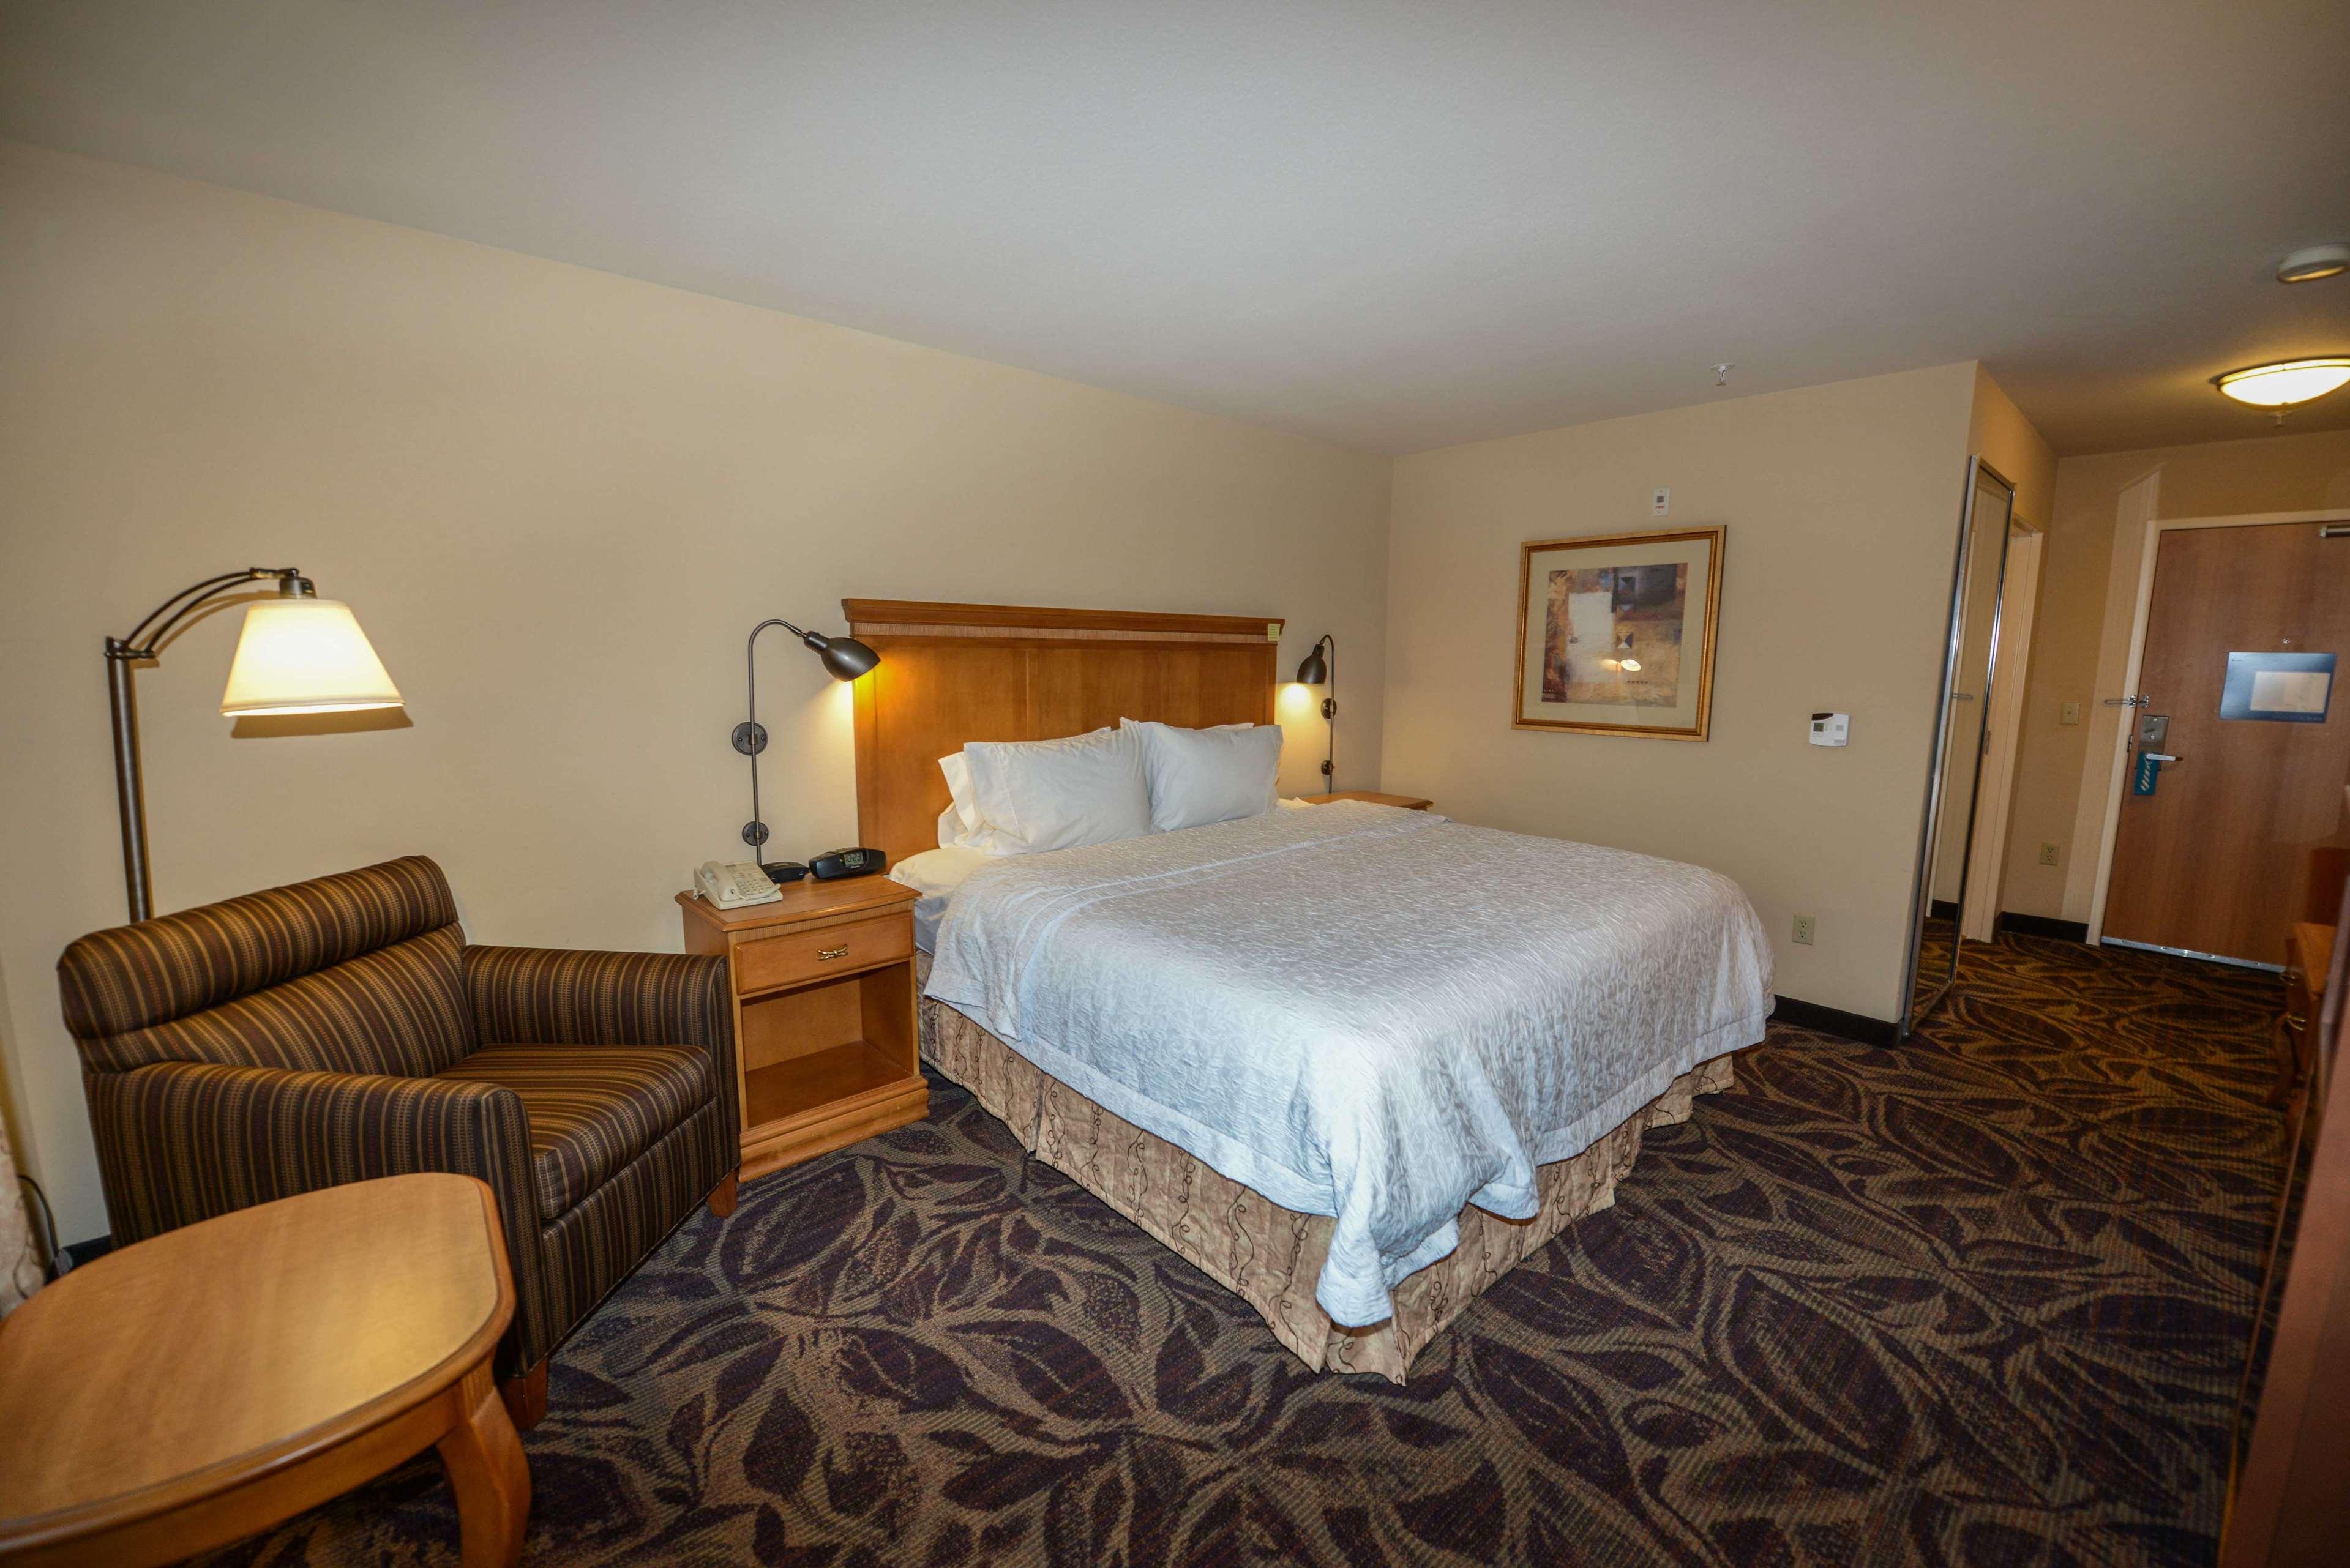 Hampton Inn & Suites Bremerton image 38